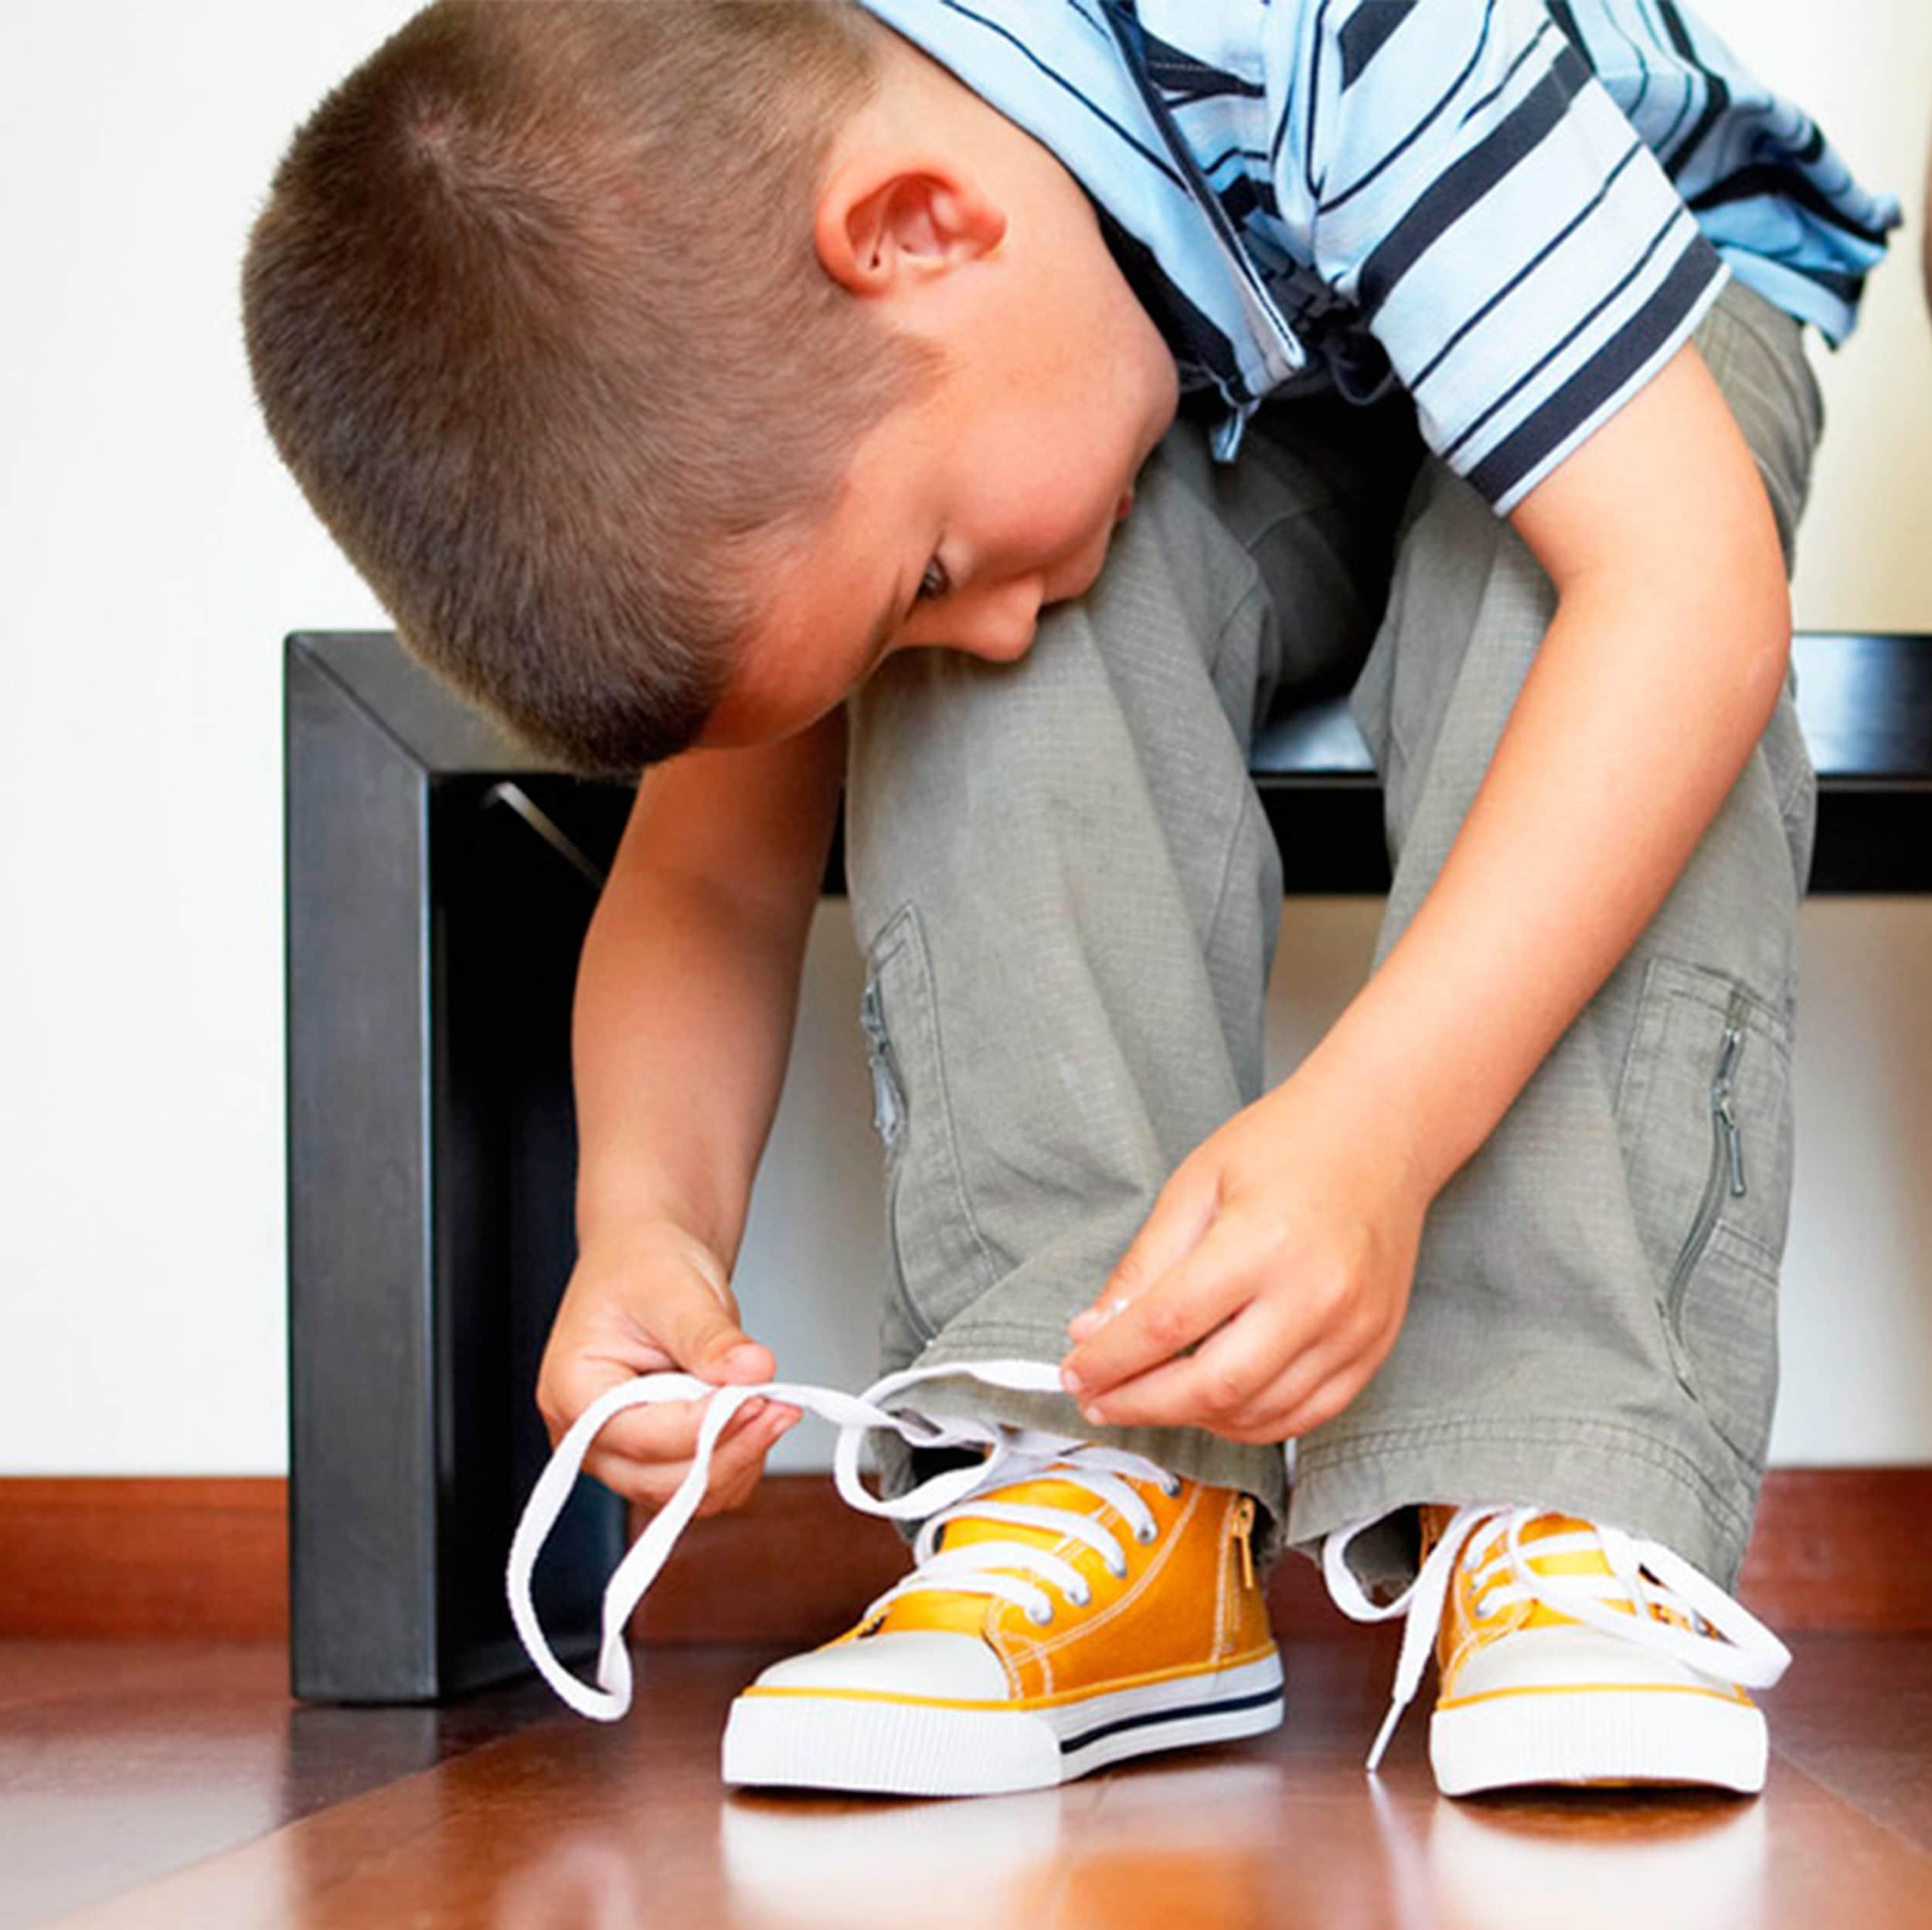 Calzado infantil de calidad para niño online